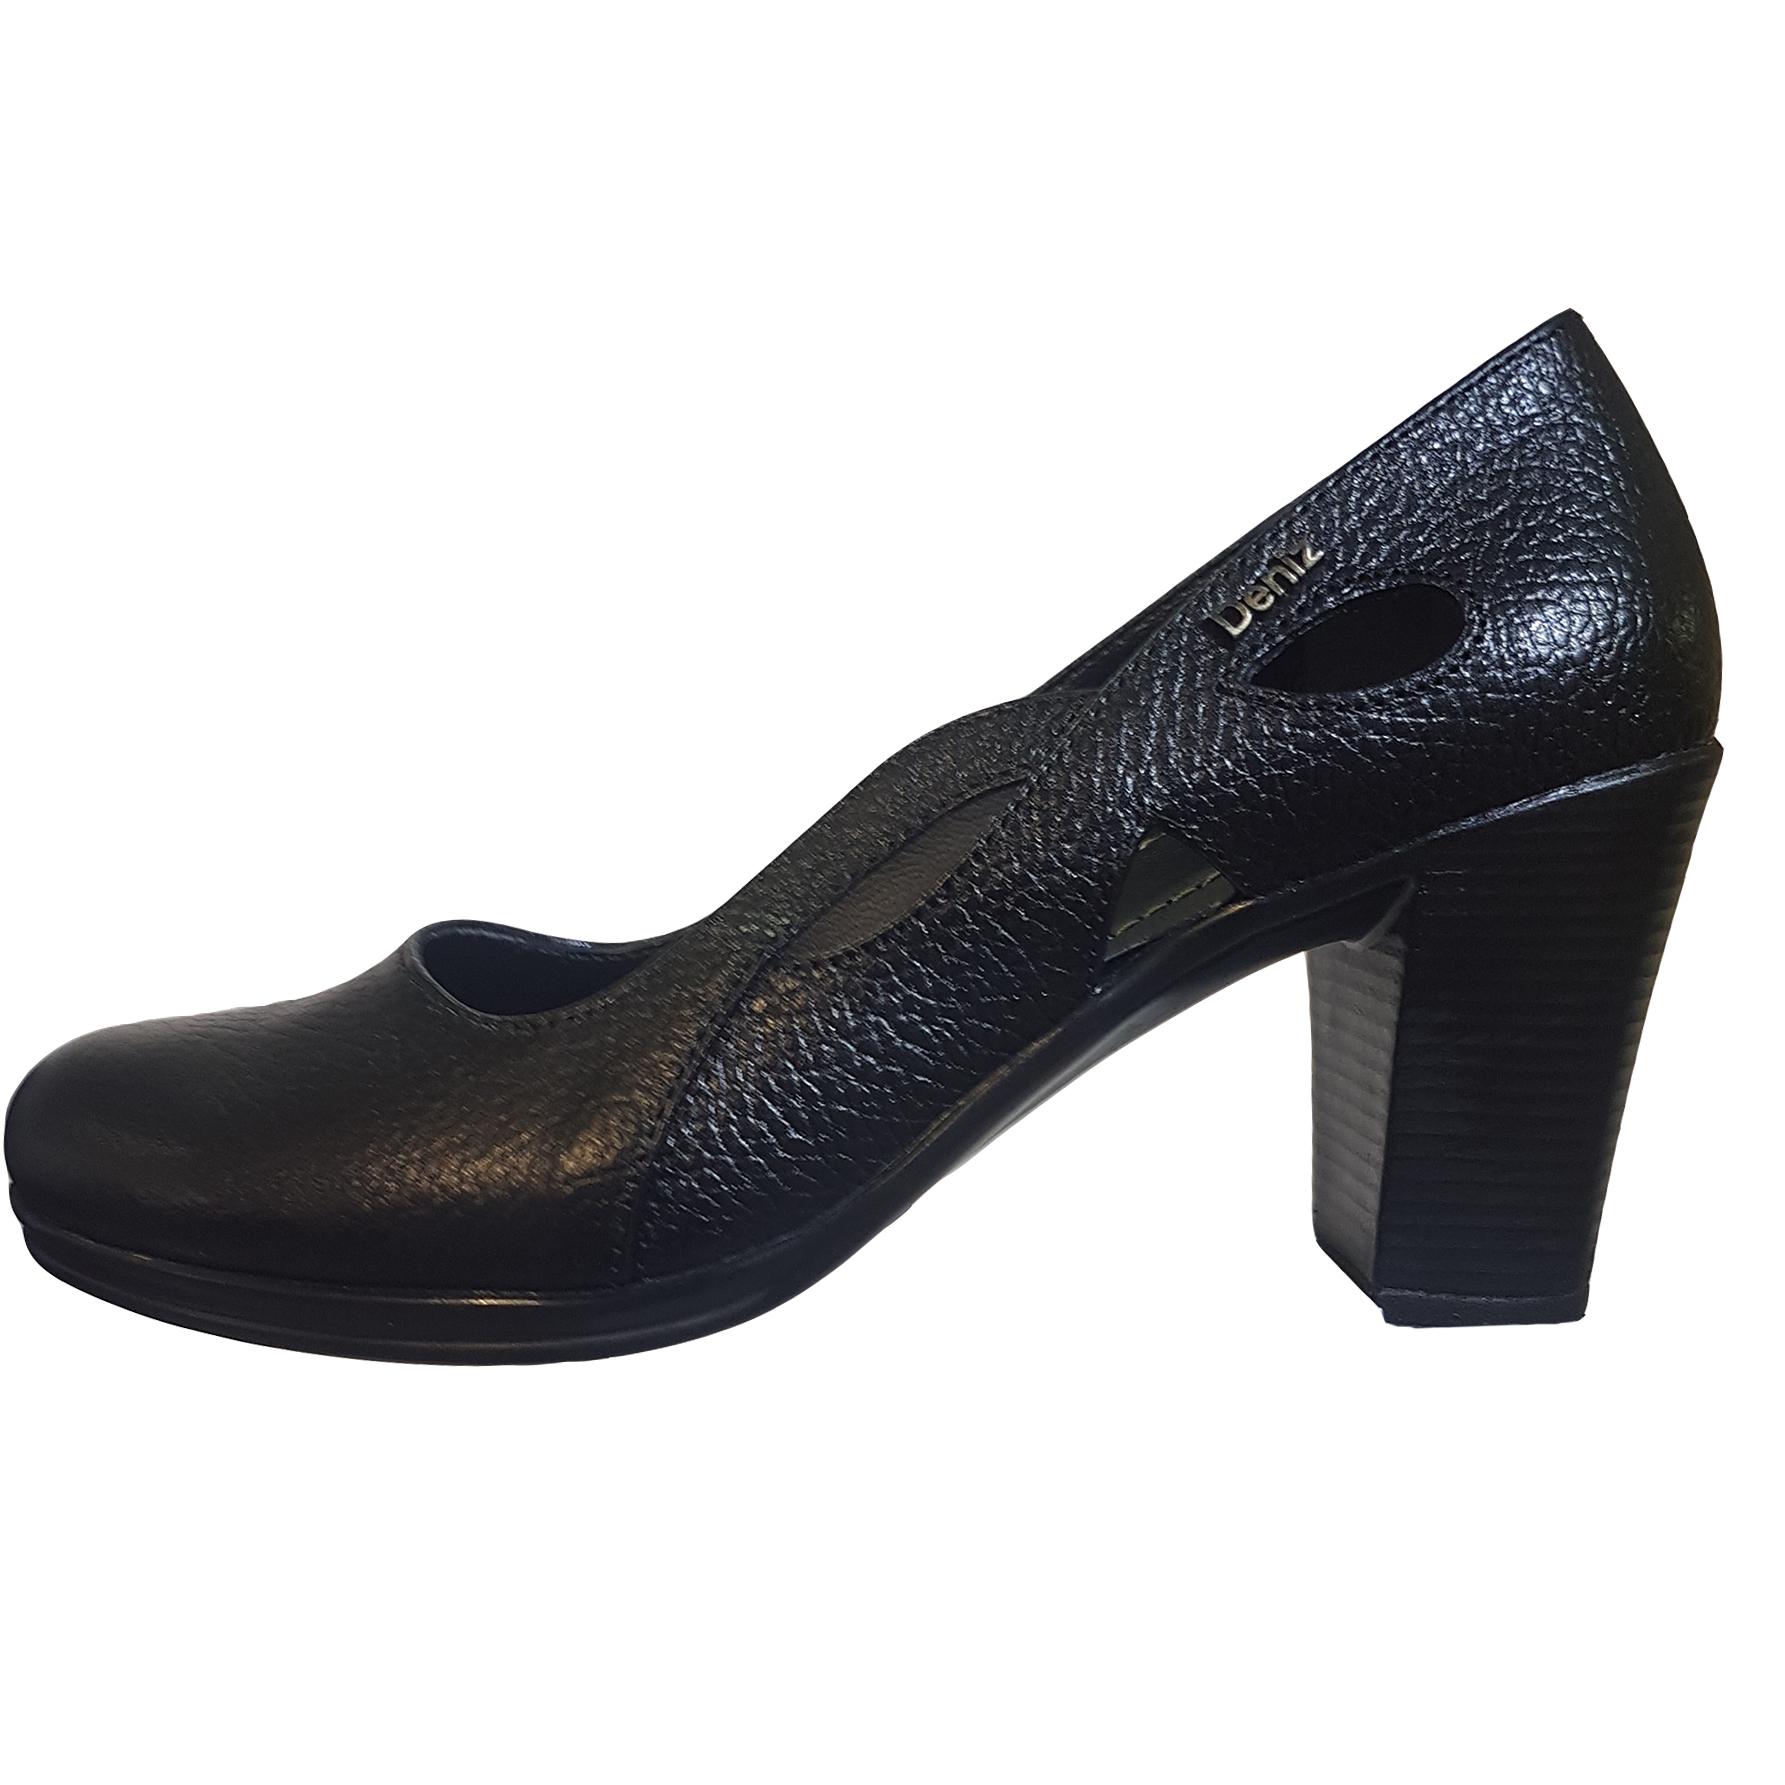 تصویر کفش زنانه کد 400